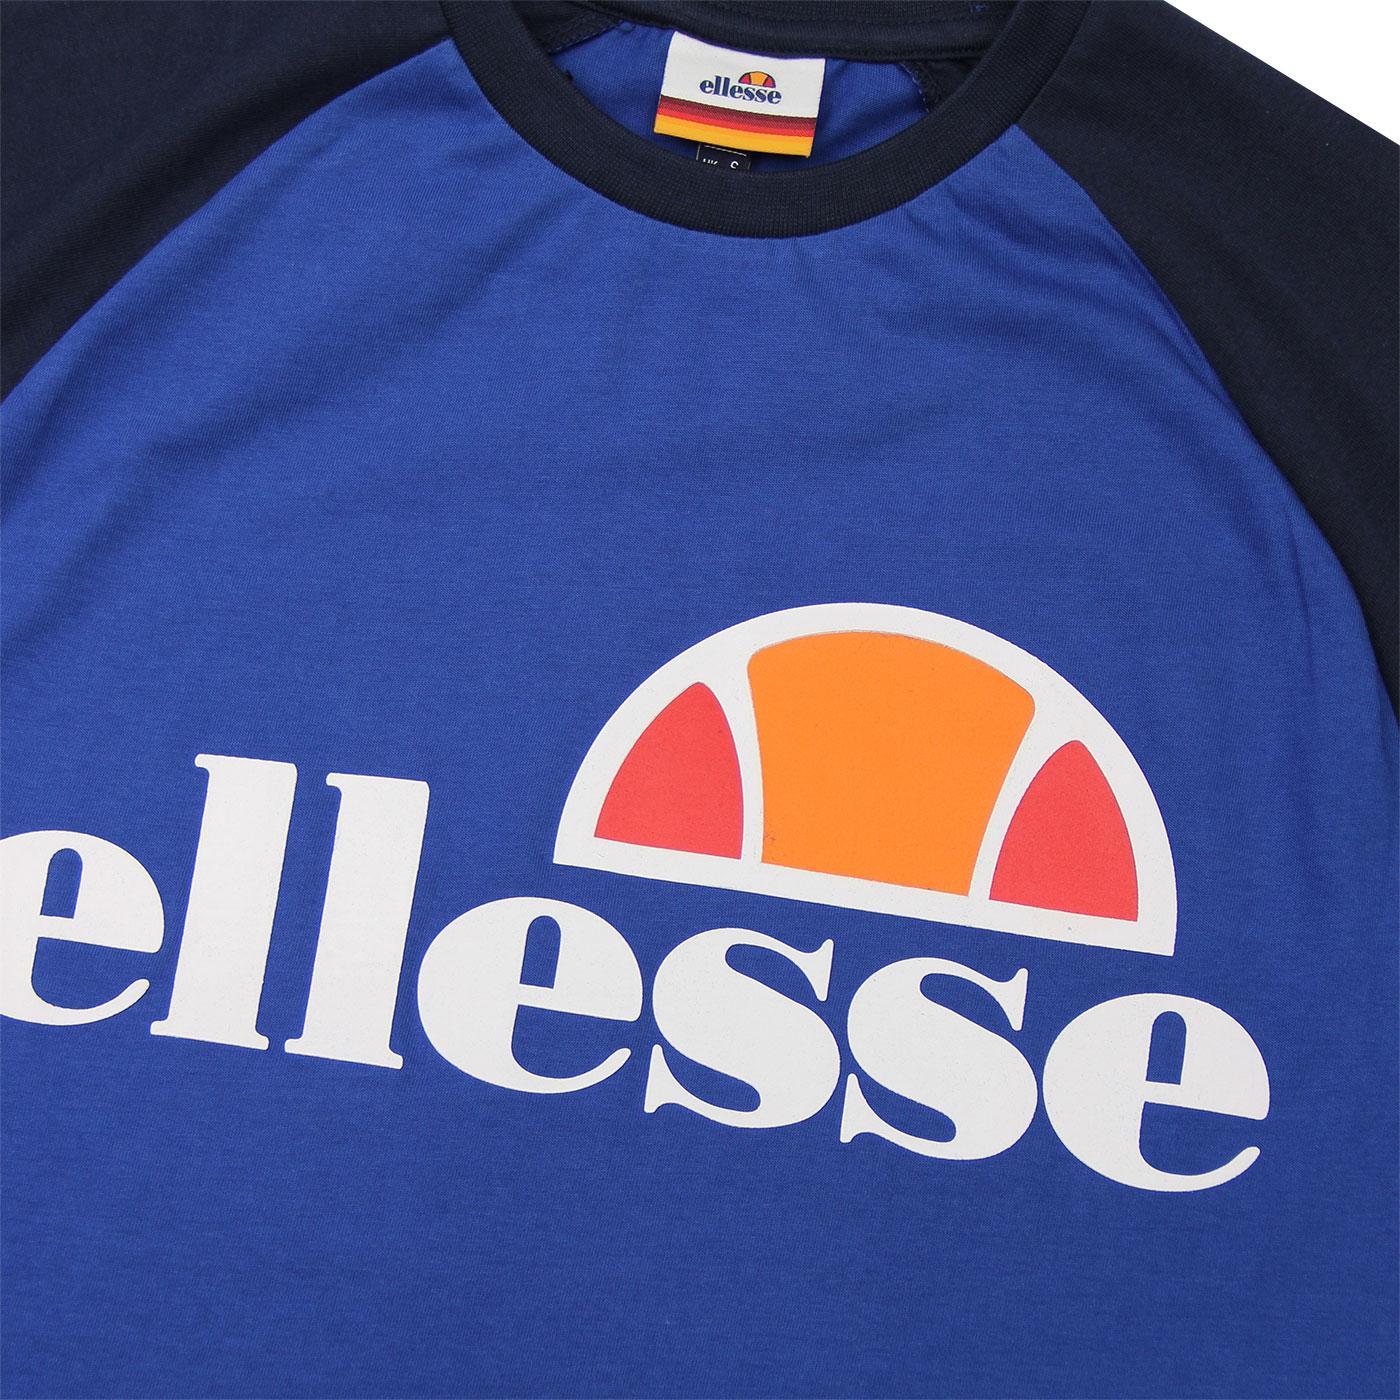 8cb3dbc7 ELLESSE Cassina Retro 80s Raglan T-Shirt in Mazerine Blue